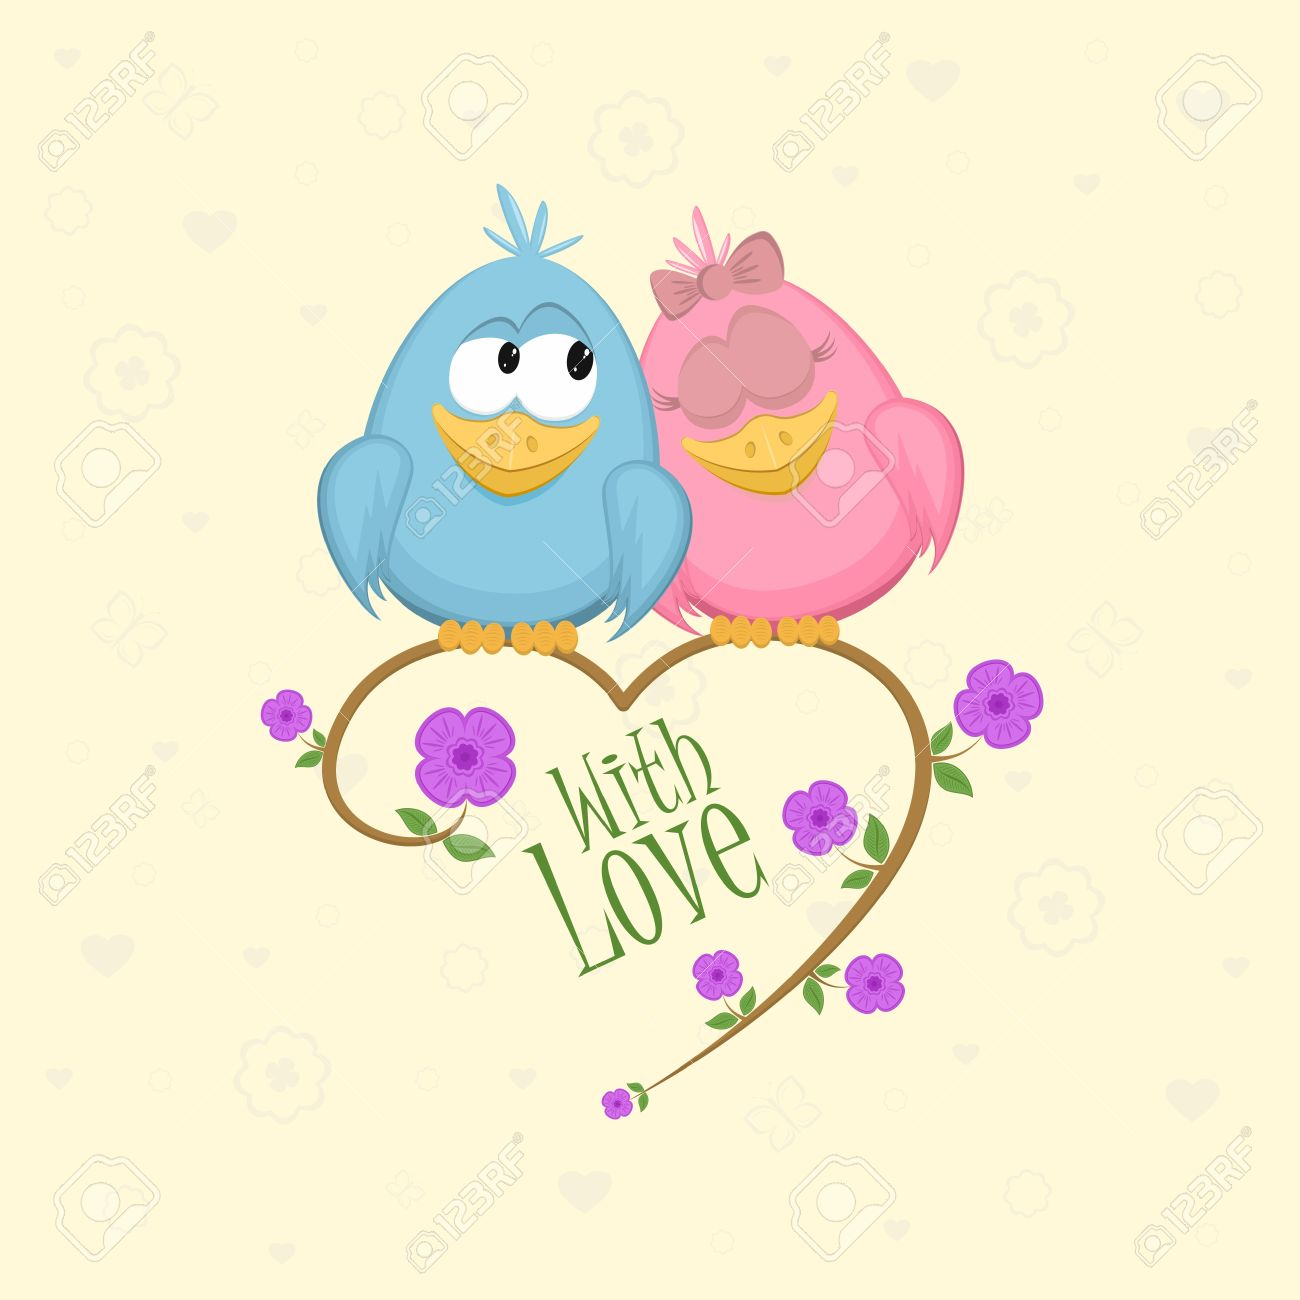 Love birds on the branch, vector illustration Stock Vector - 11674856